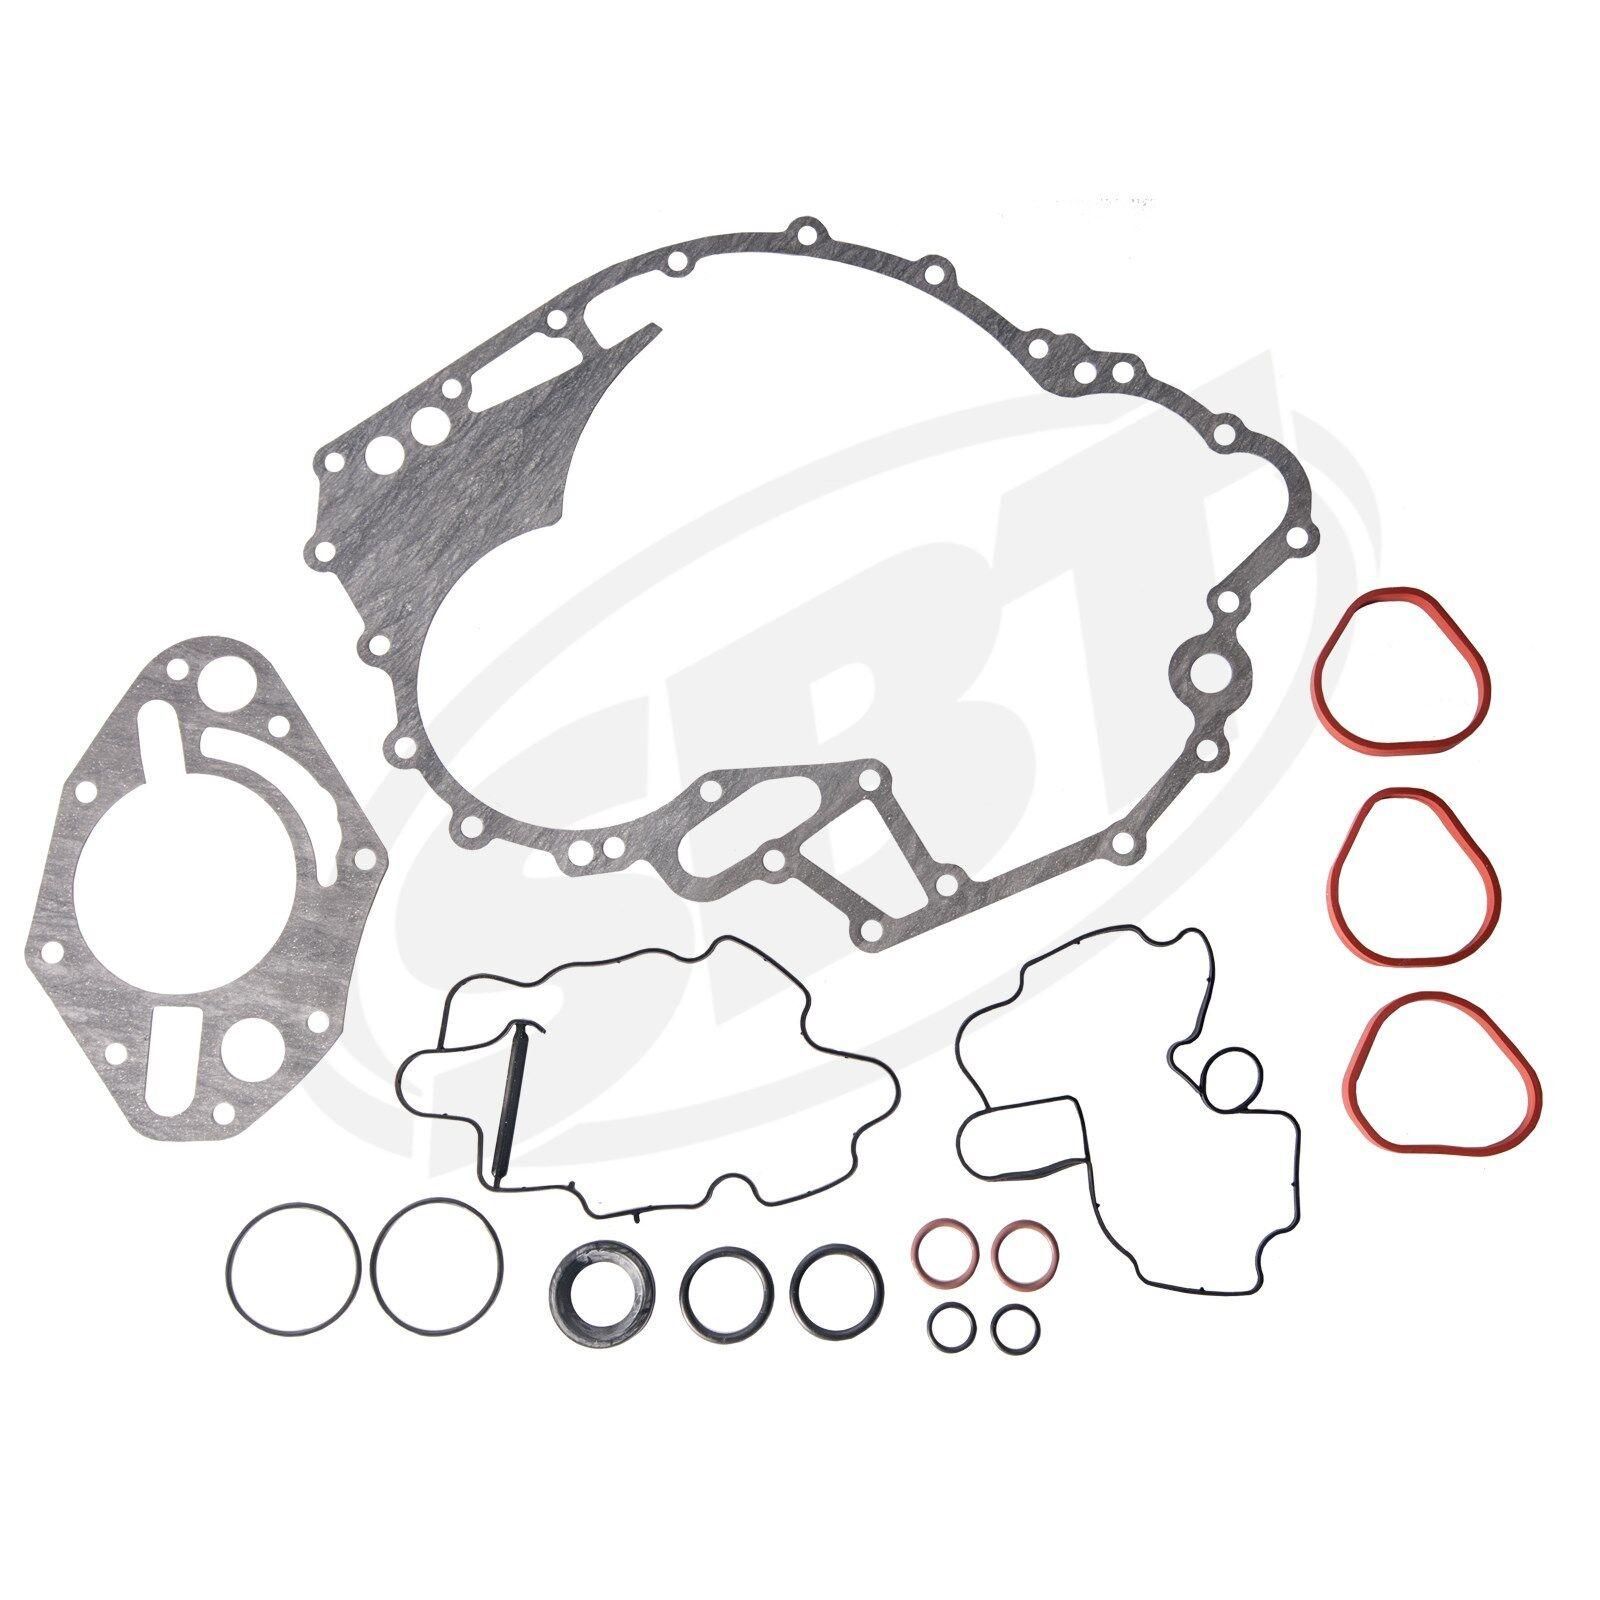 Seadoo GTX 4-Tec Engine Installation Gasket RXP RXT